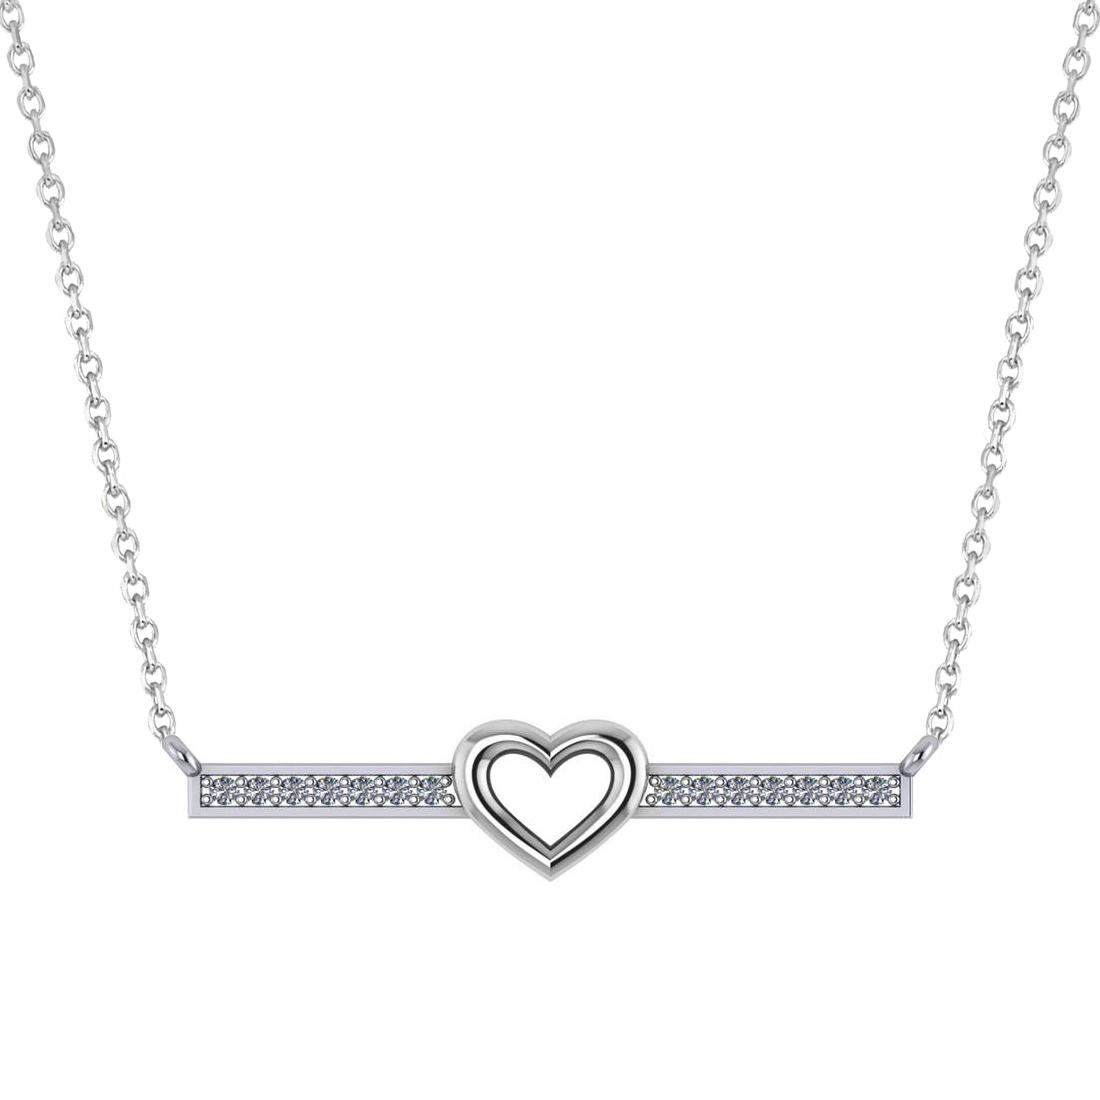 diamond bar pendant necklace w heart 14k white gold 0. Black Bedroom Furniture Sets. Home Design Ideas